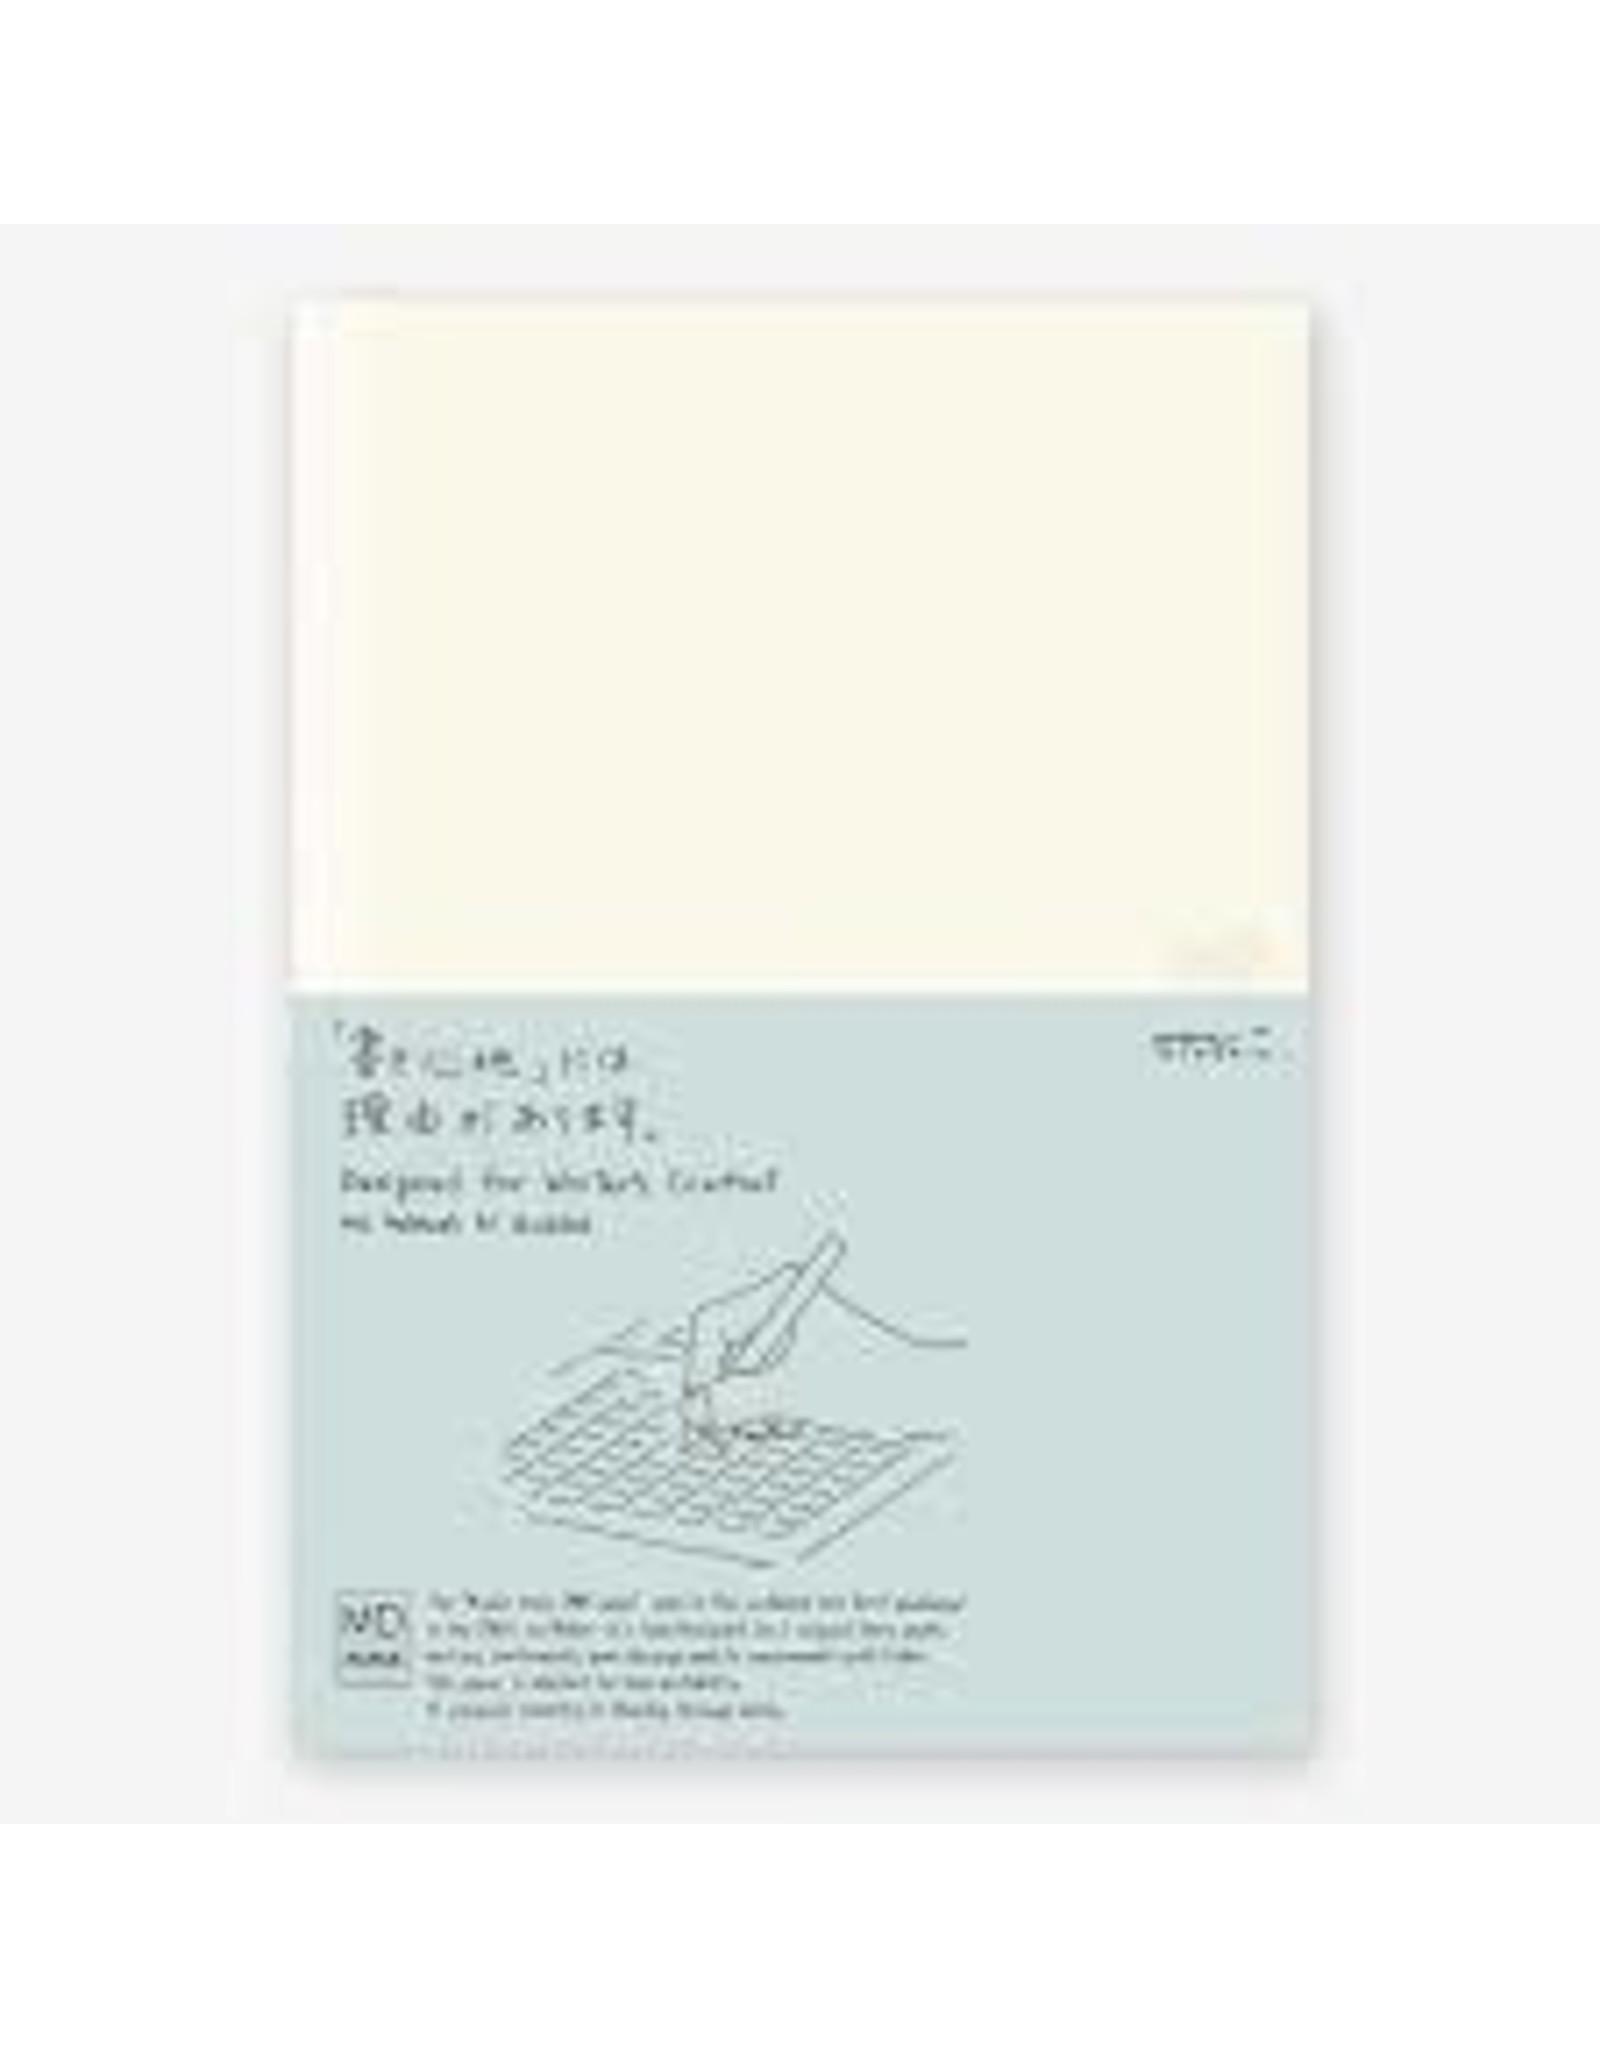 Designphil Inc. MD NOTEBOOK A5 GRID